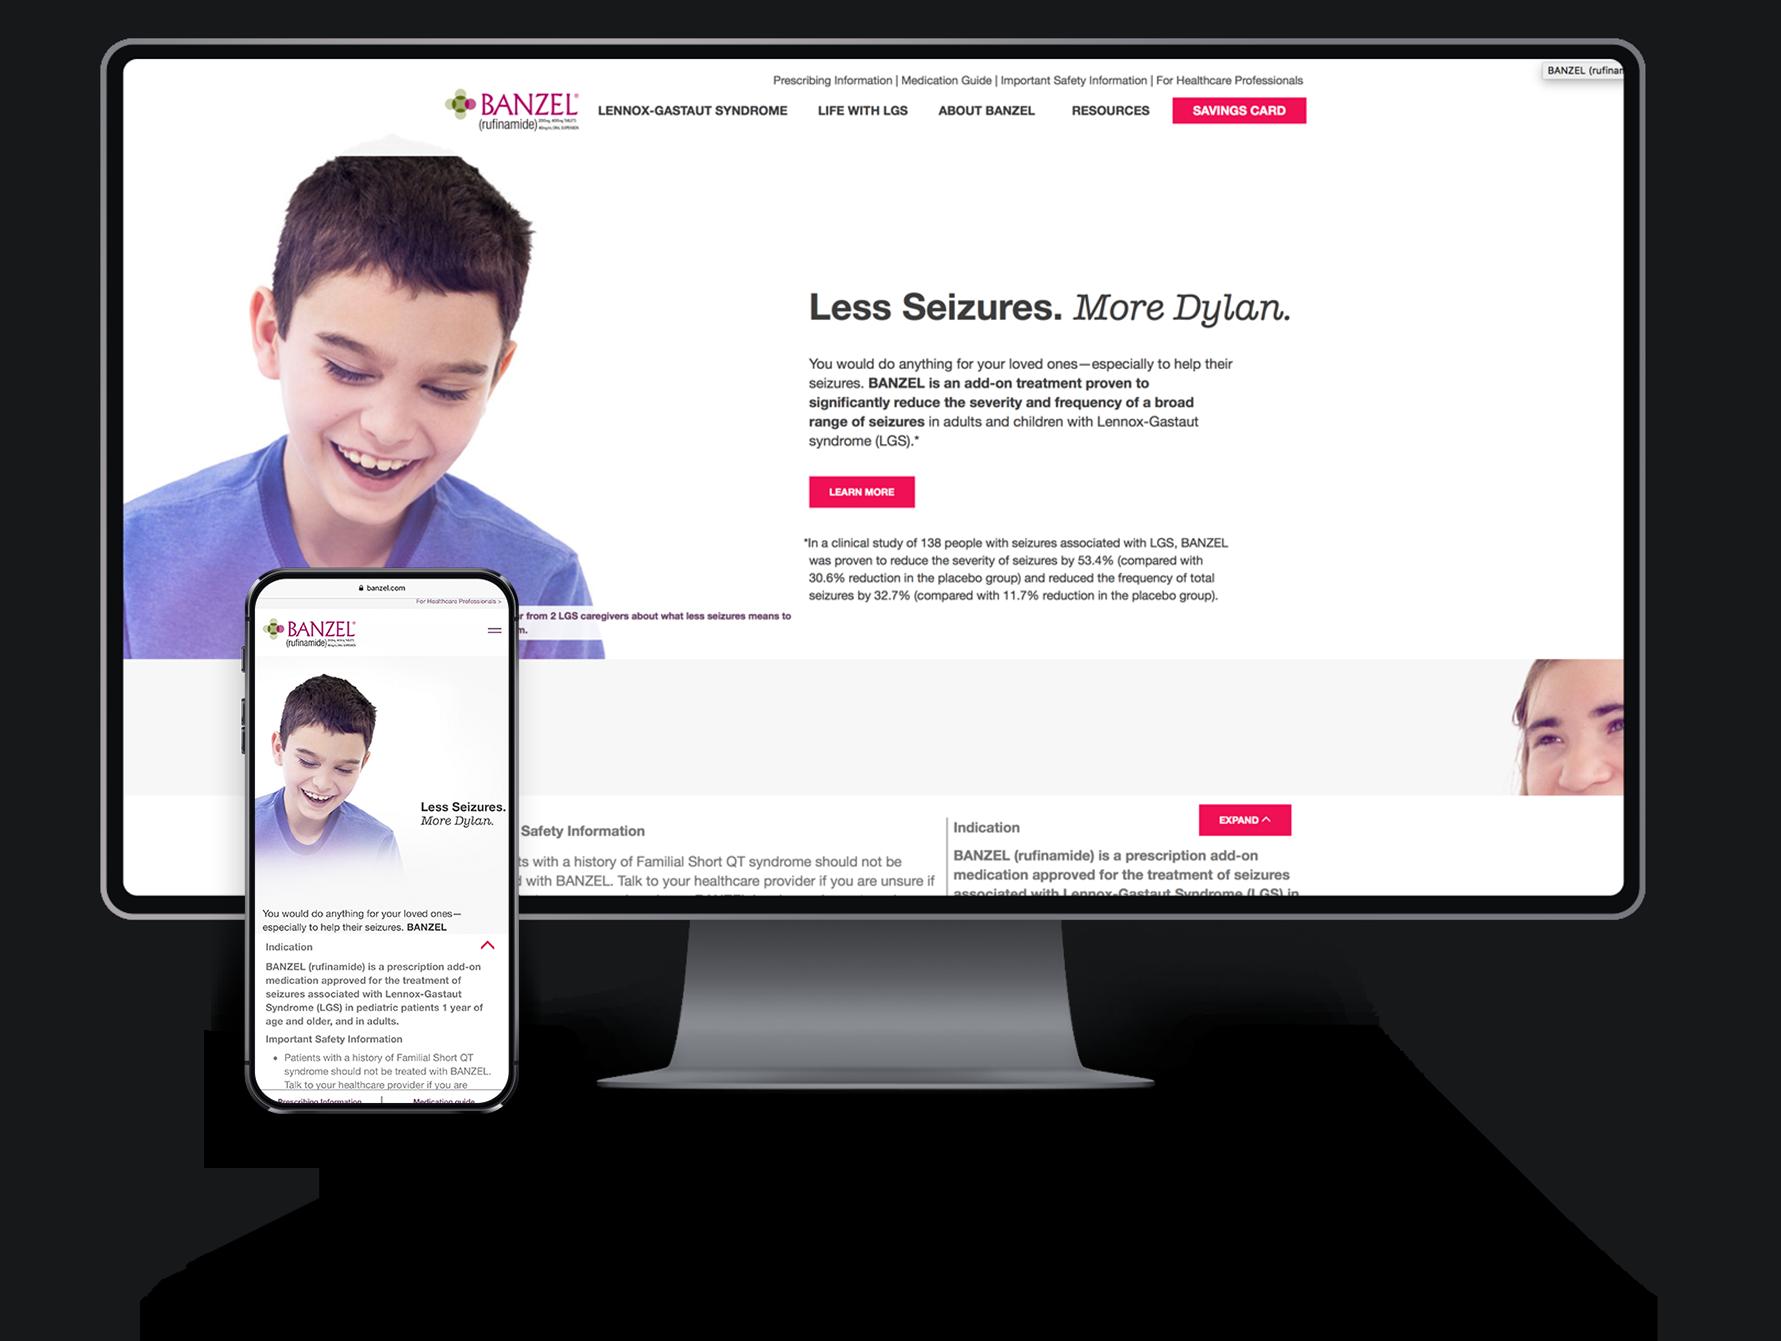 image of Patients & Purpose Wins 2019 Best Pharmaceuticals Mobile Website Mobile WebAward for Love Less Seizures